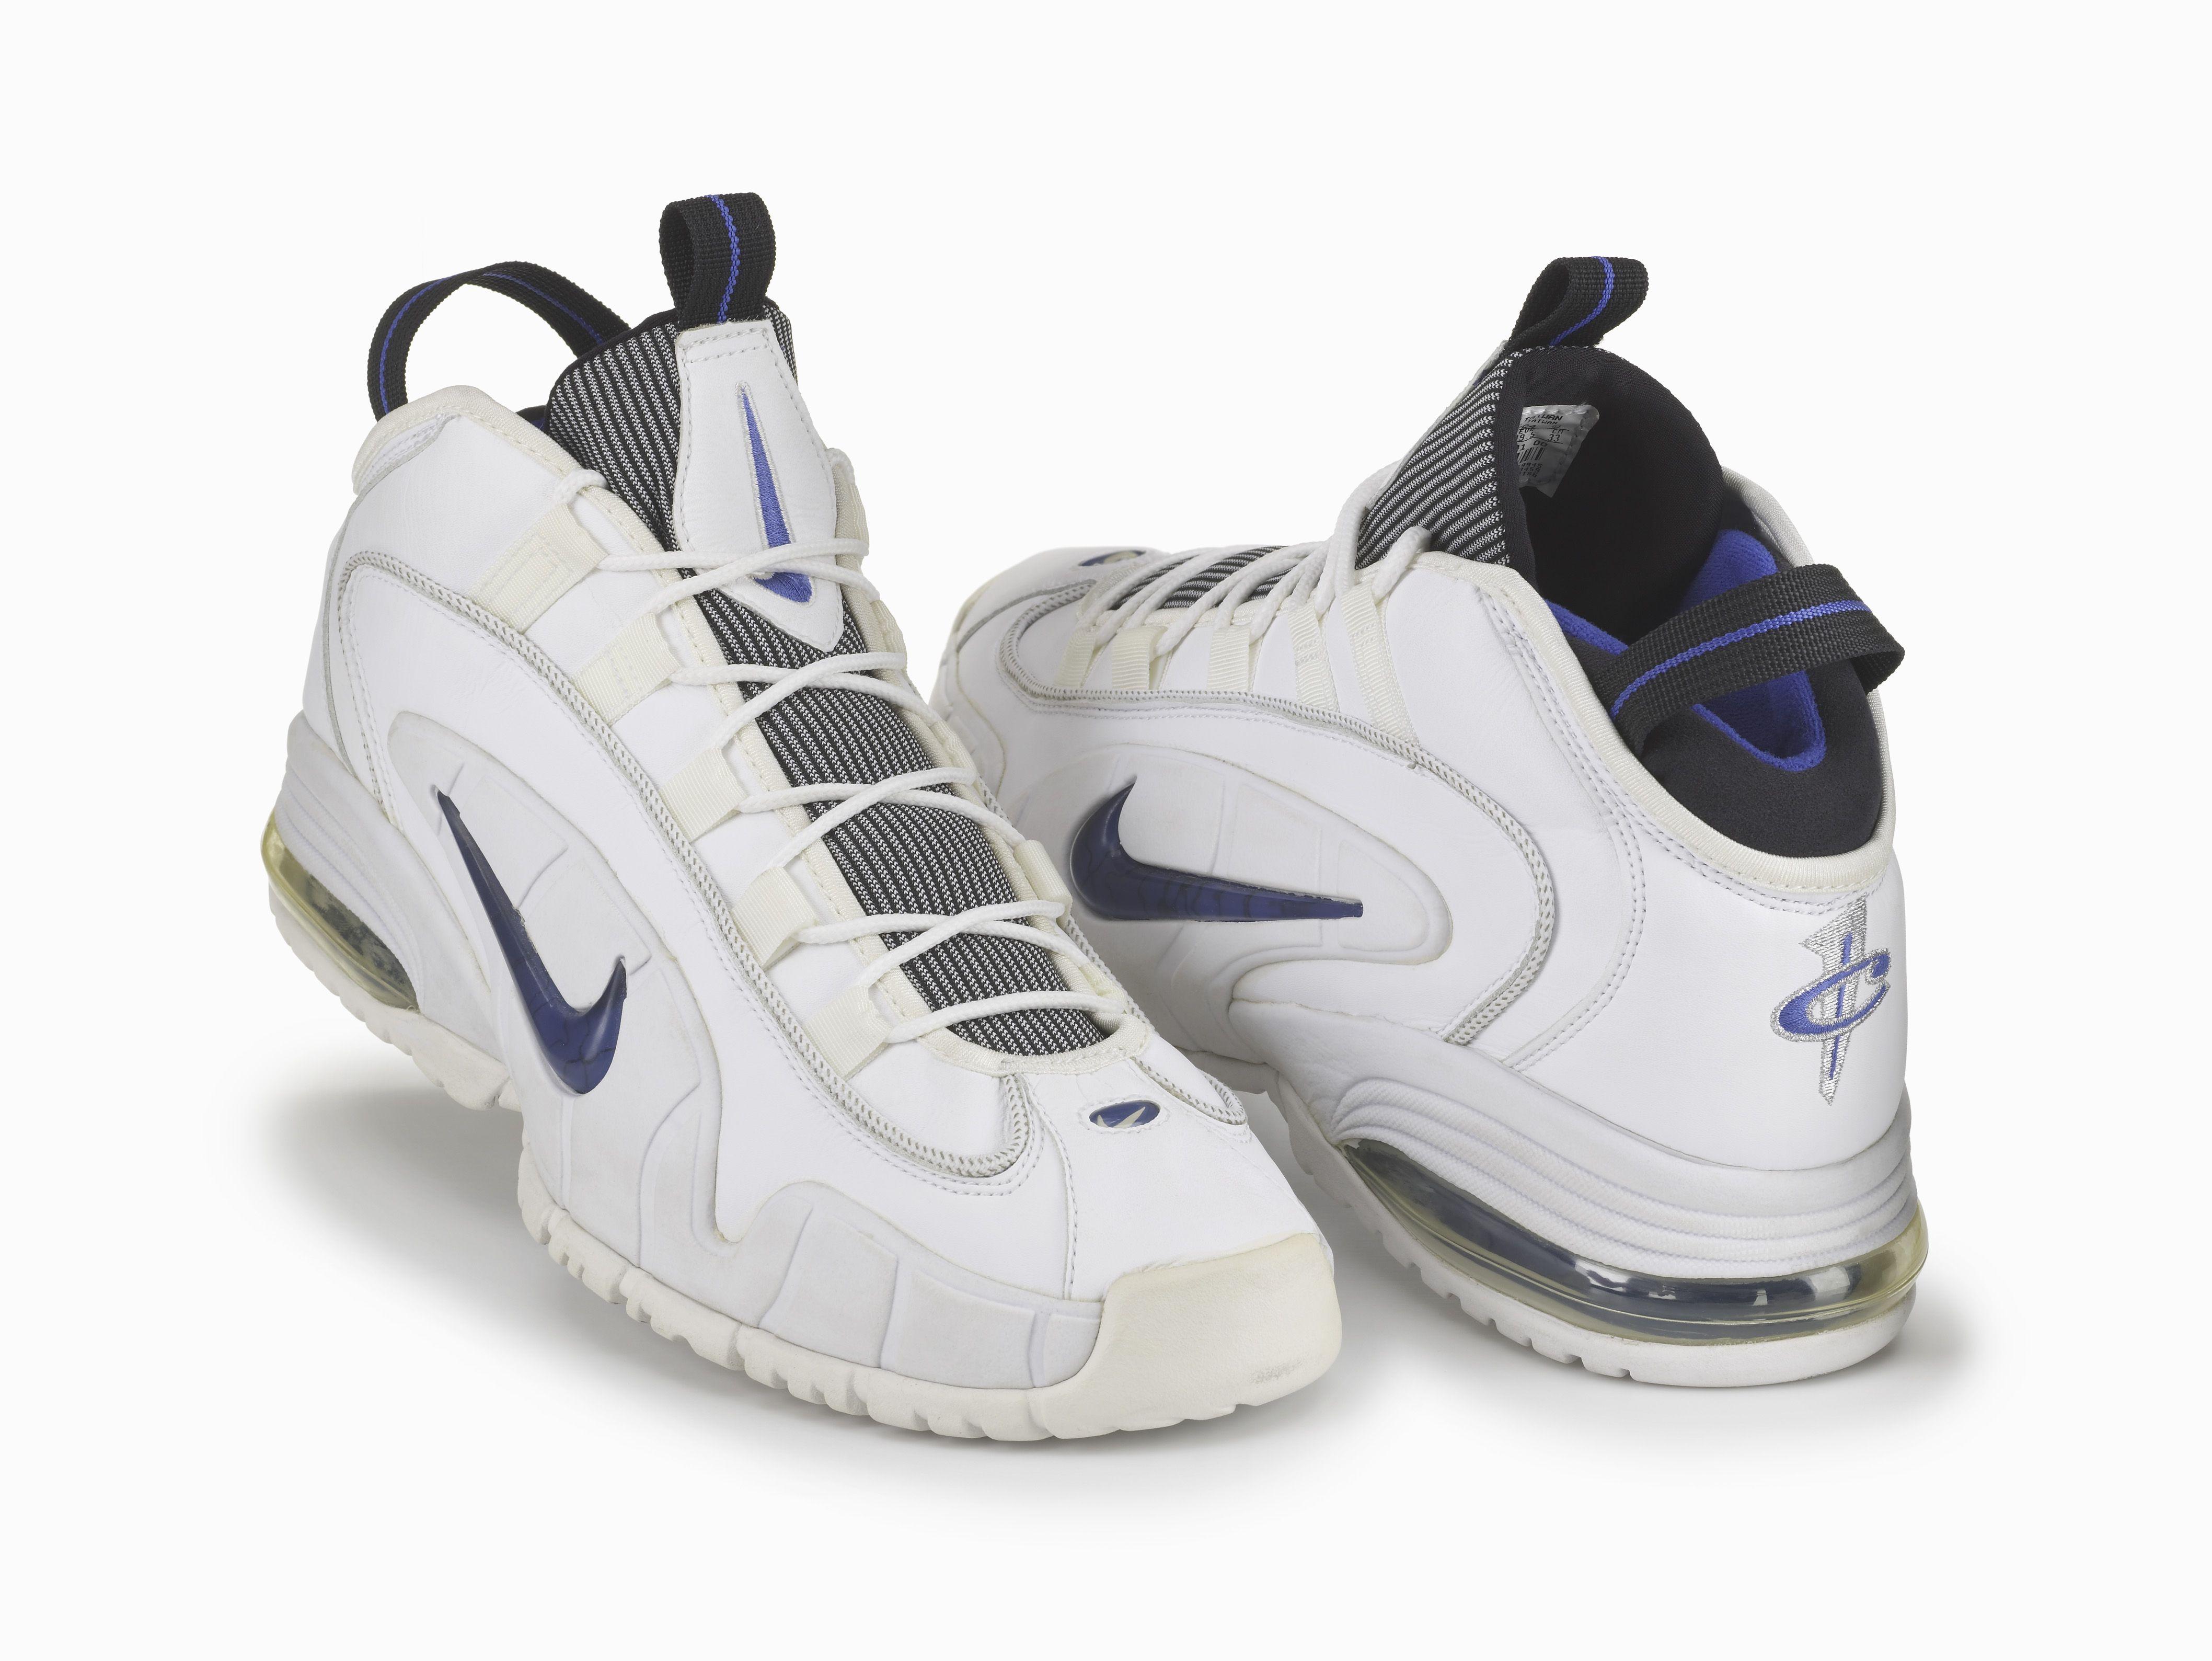 a40e69fd112f Nike Air Max Penny - Penny Hardaway